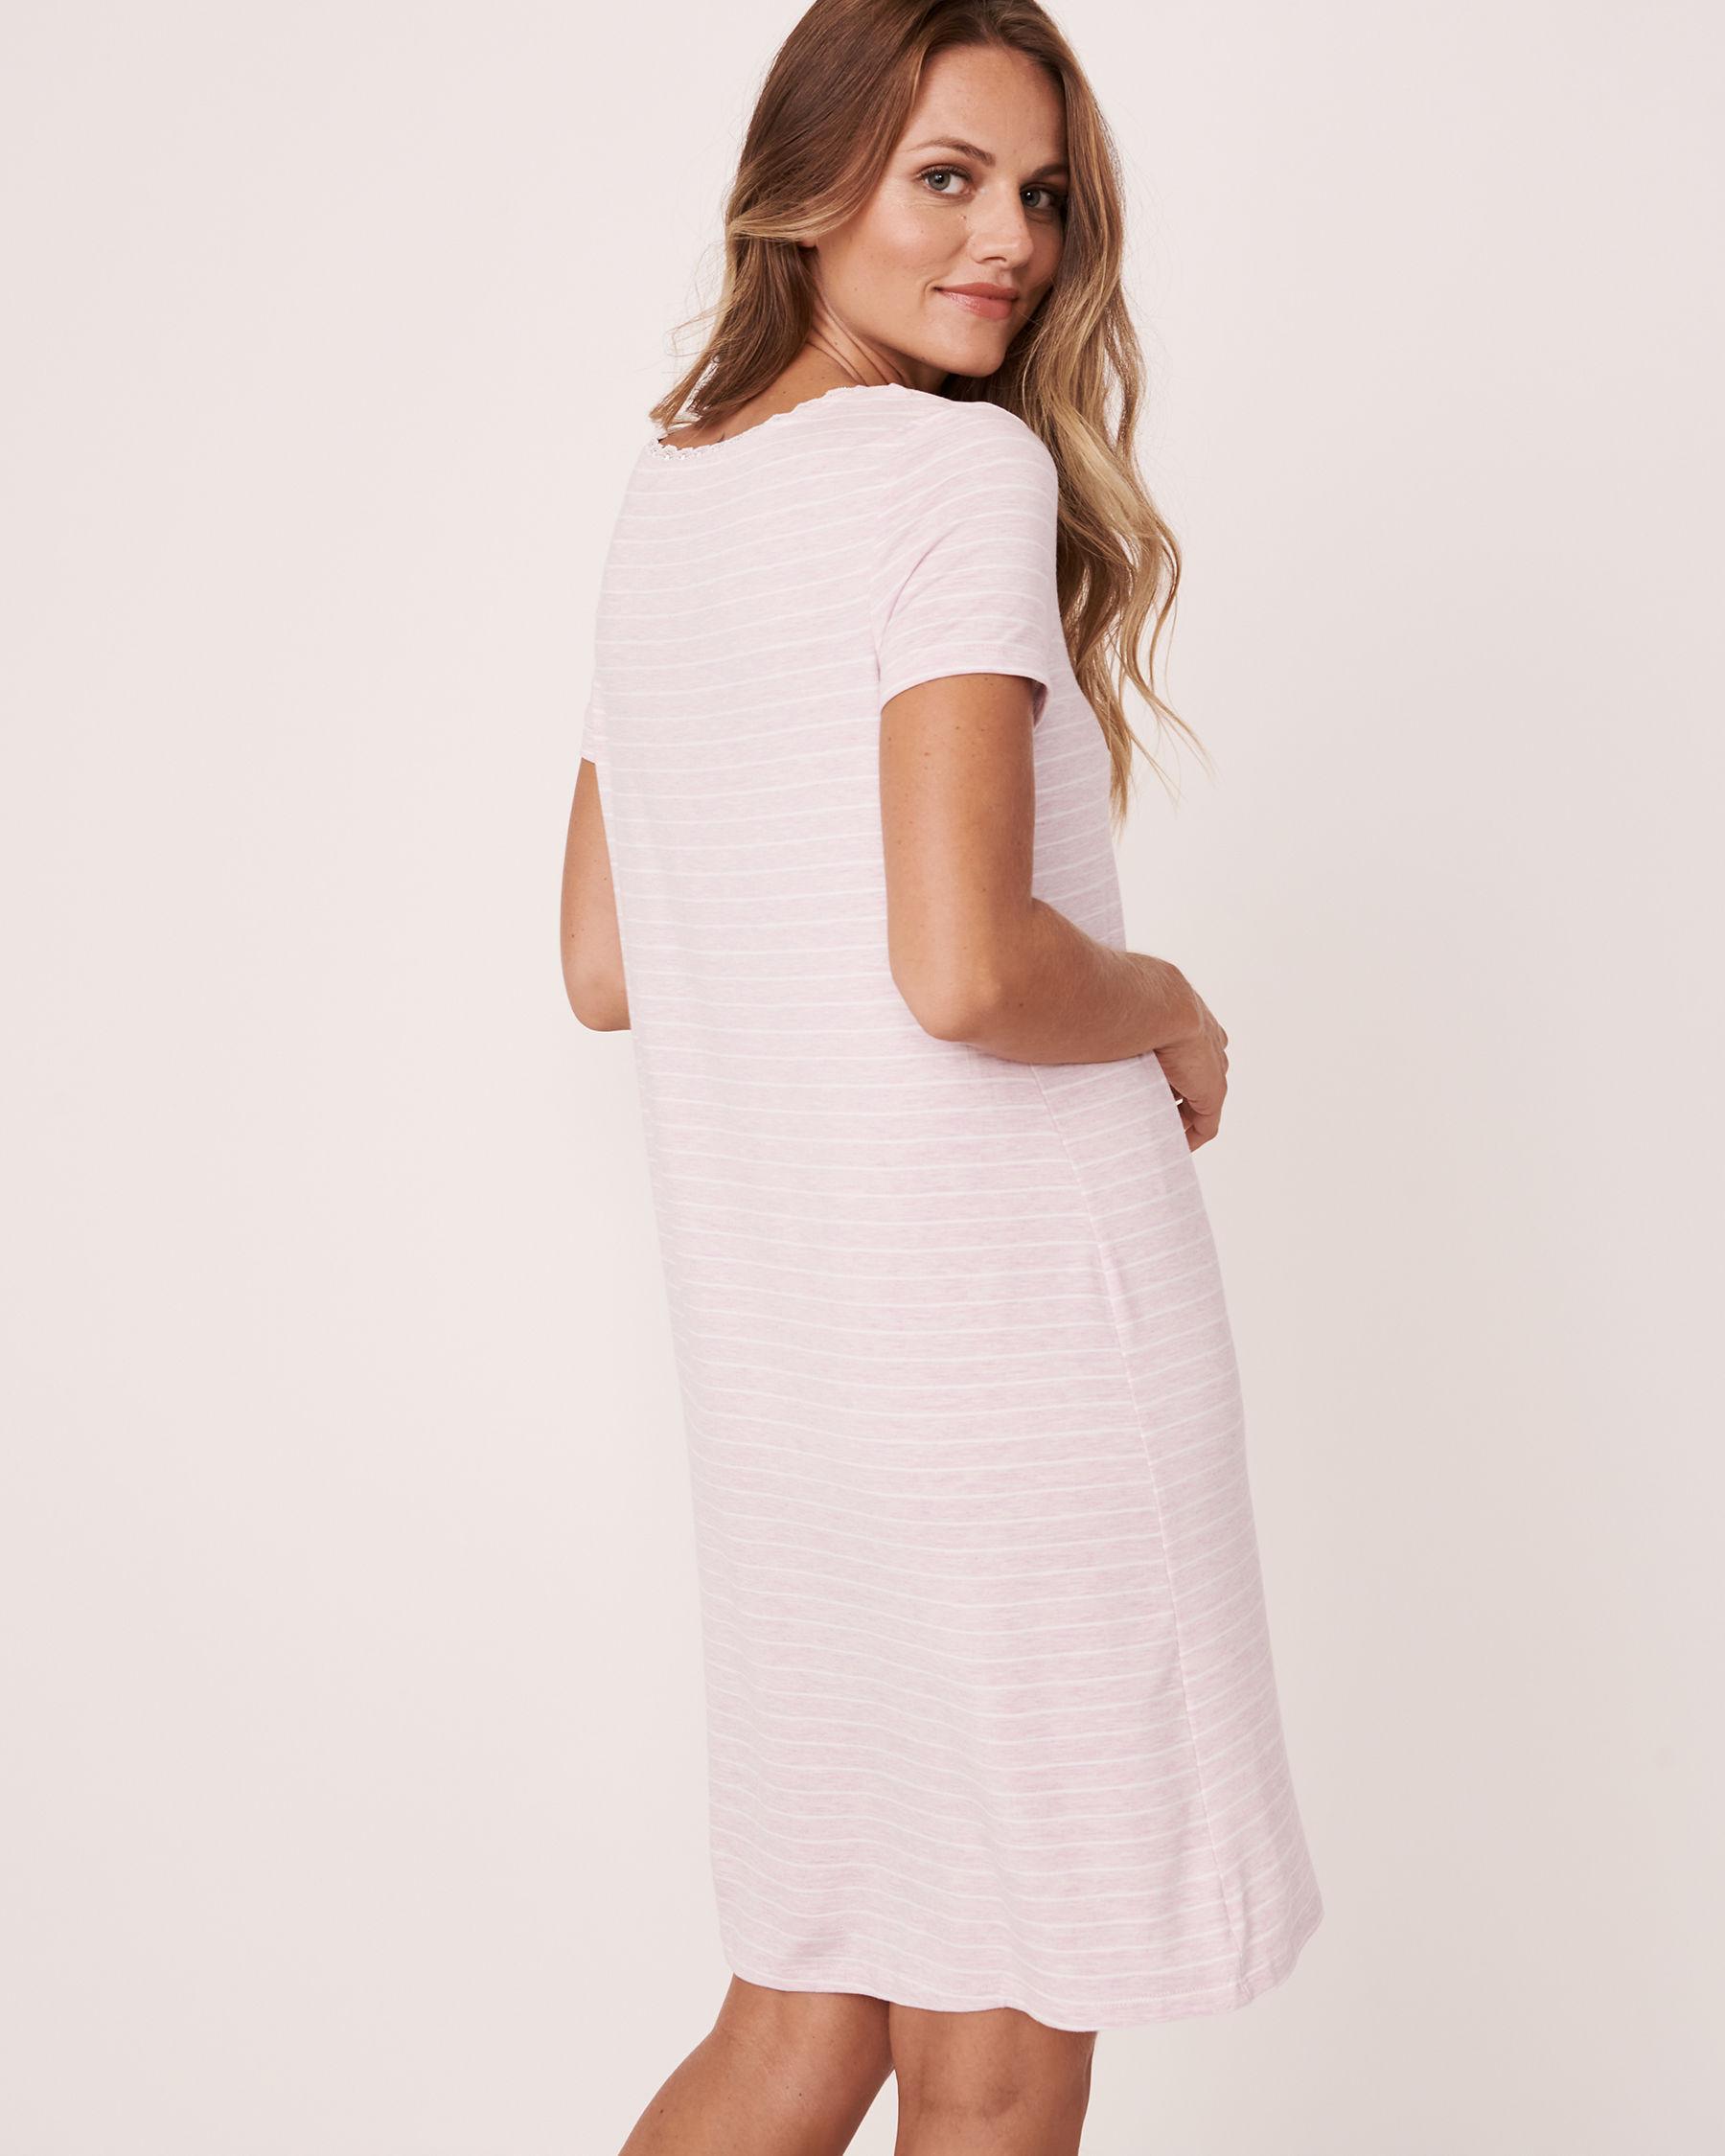 LA VIE EN ROSE Henley Sleepshirt Stripes 50400004 - View2